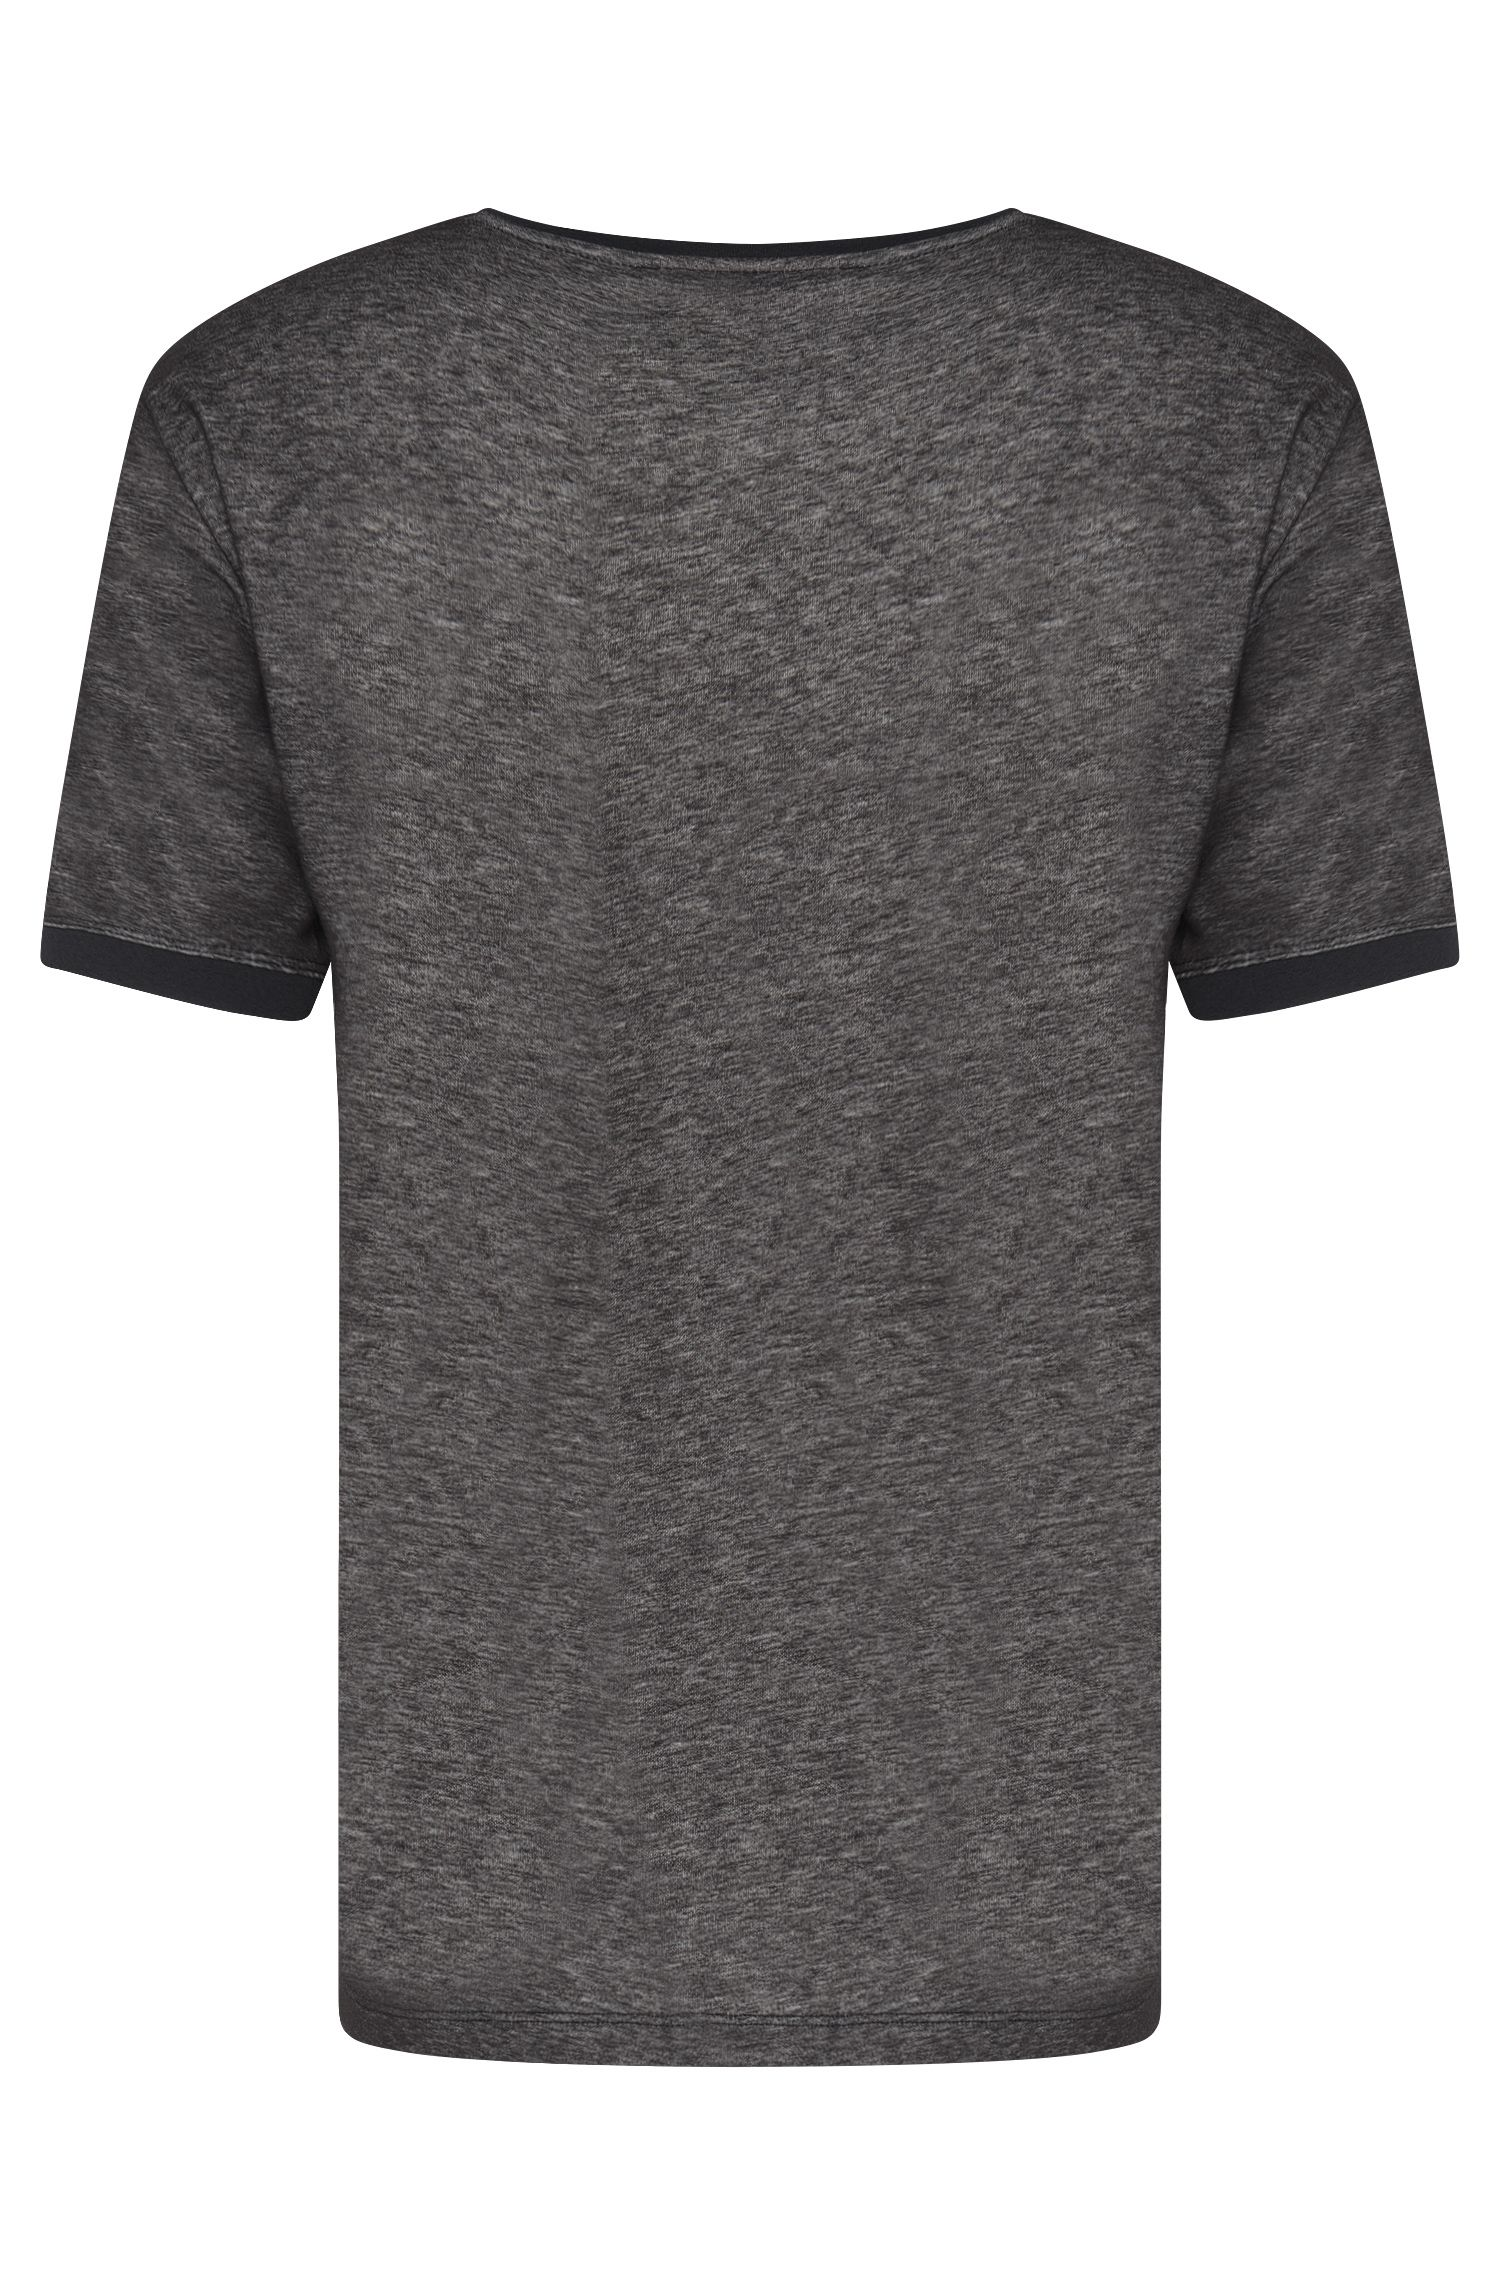 Meliertes Loose-Fit T-Shirt aus Baumwoll-Mix: 'Dircus'